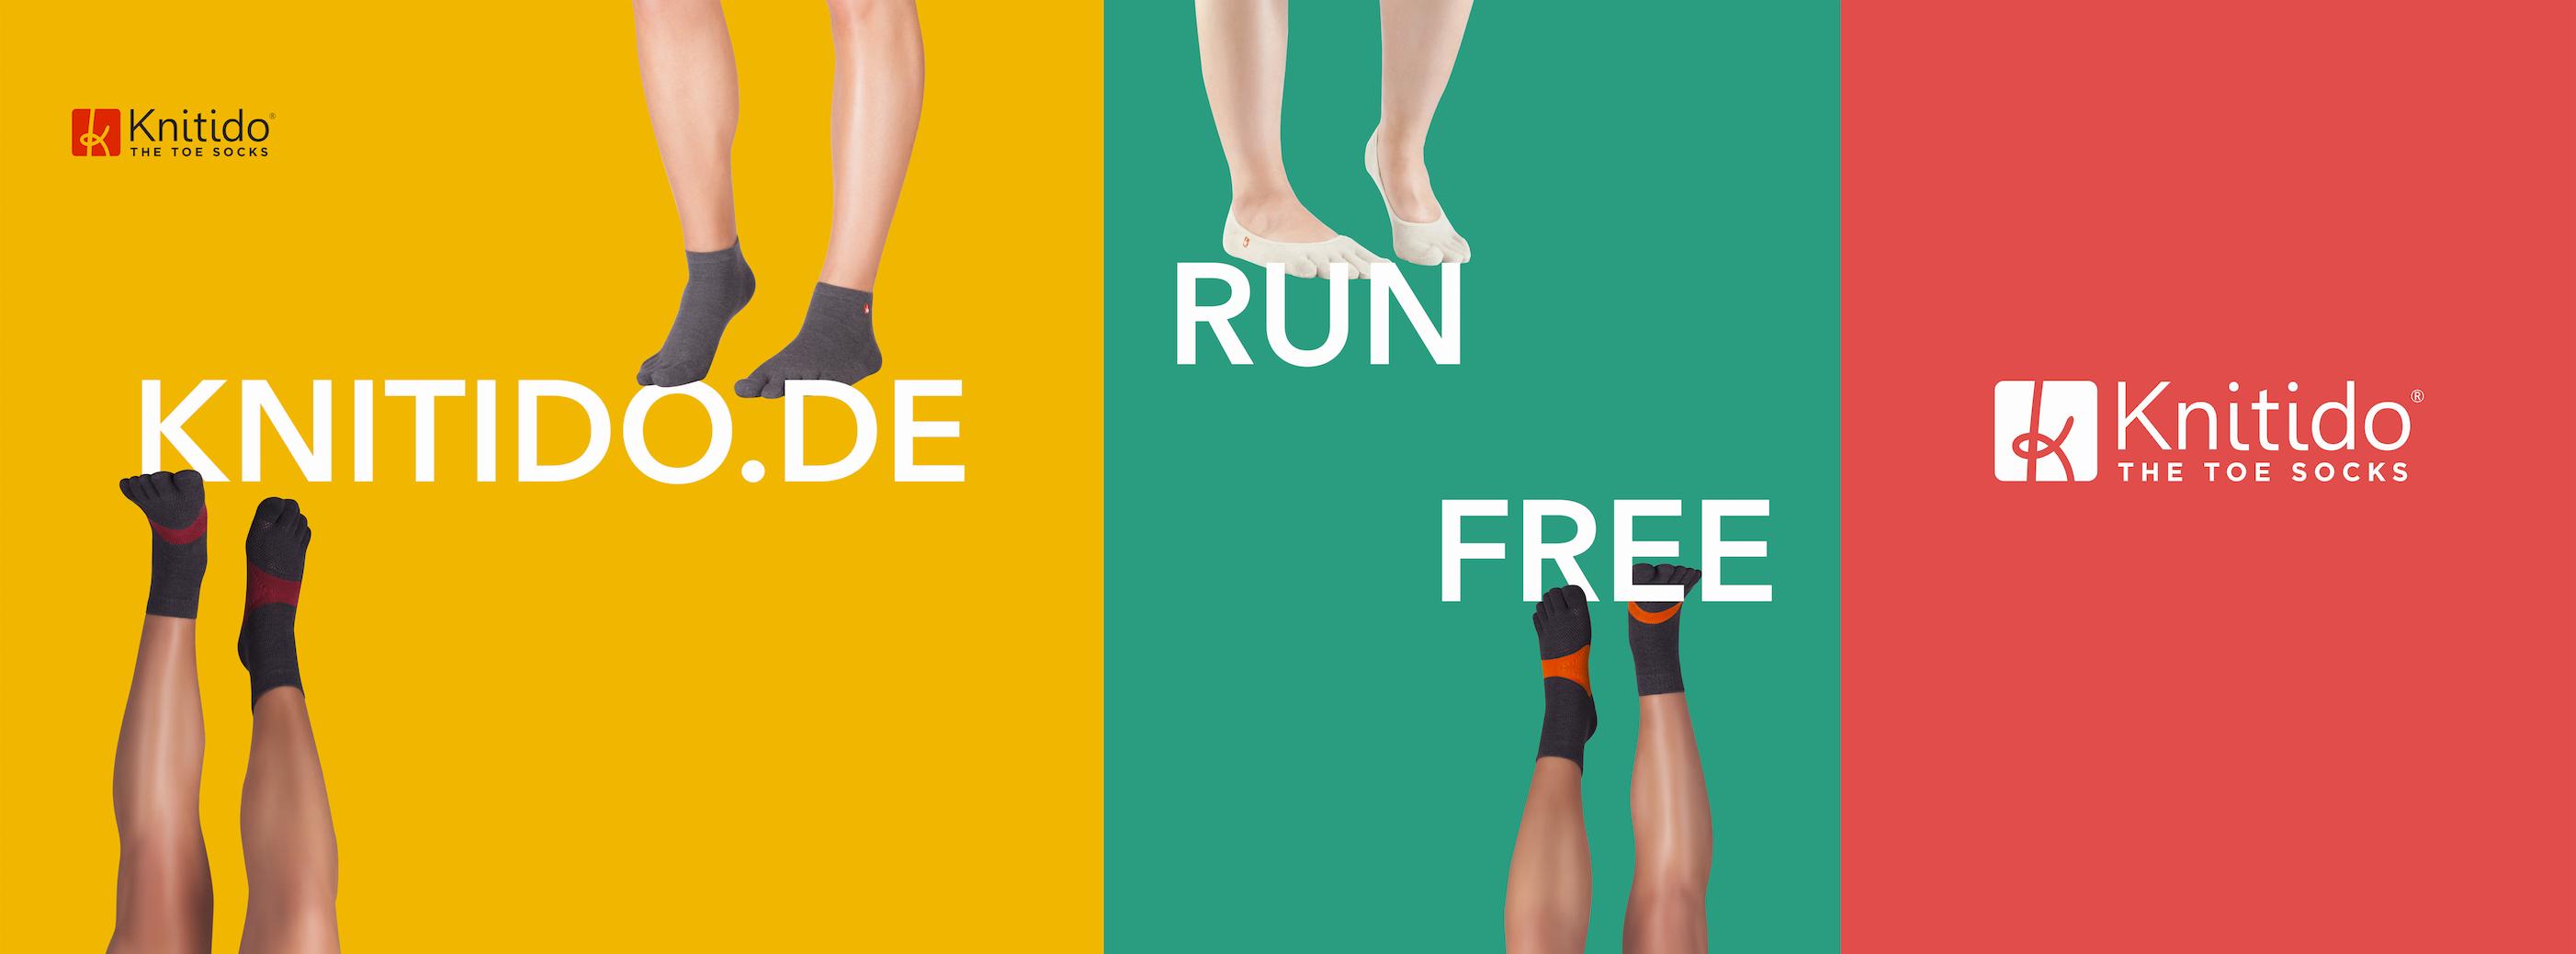 Knitido Sport-Zehensocken: Modelle Compression TS, Yoga Flow, Marathon TS Ultralite, Massage-Zehensocken. © SushiKeks